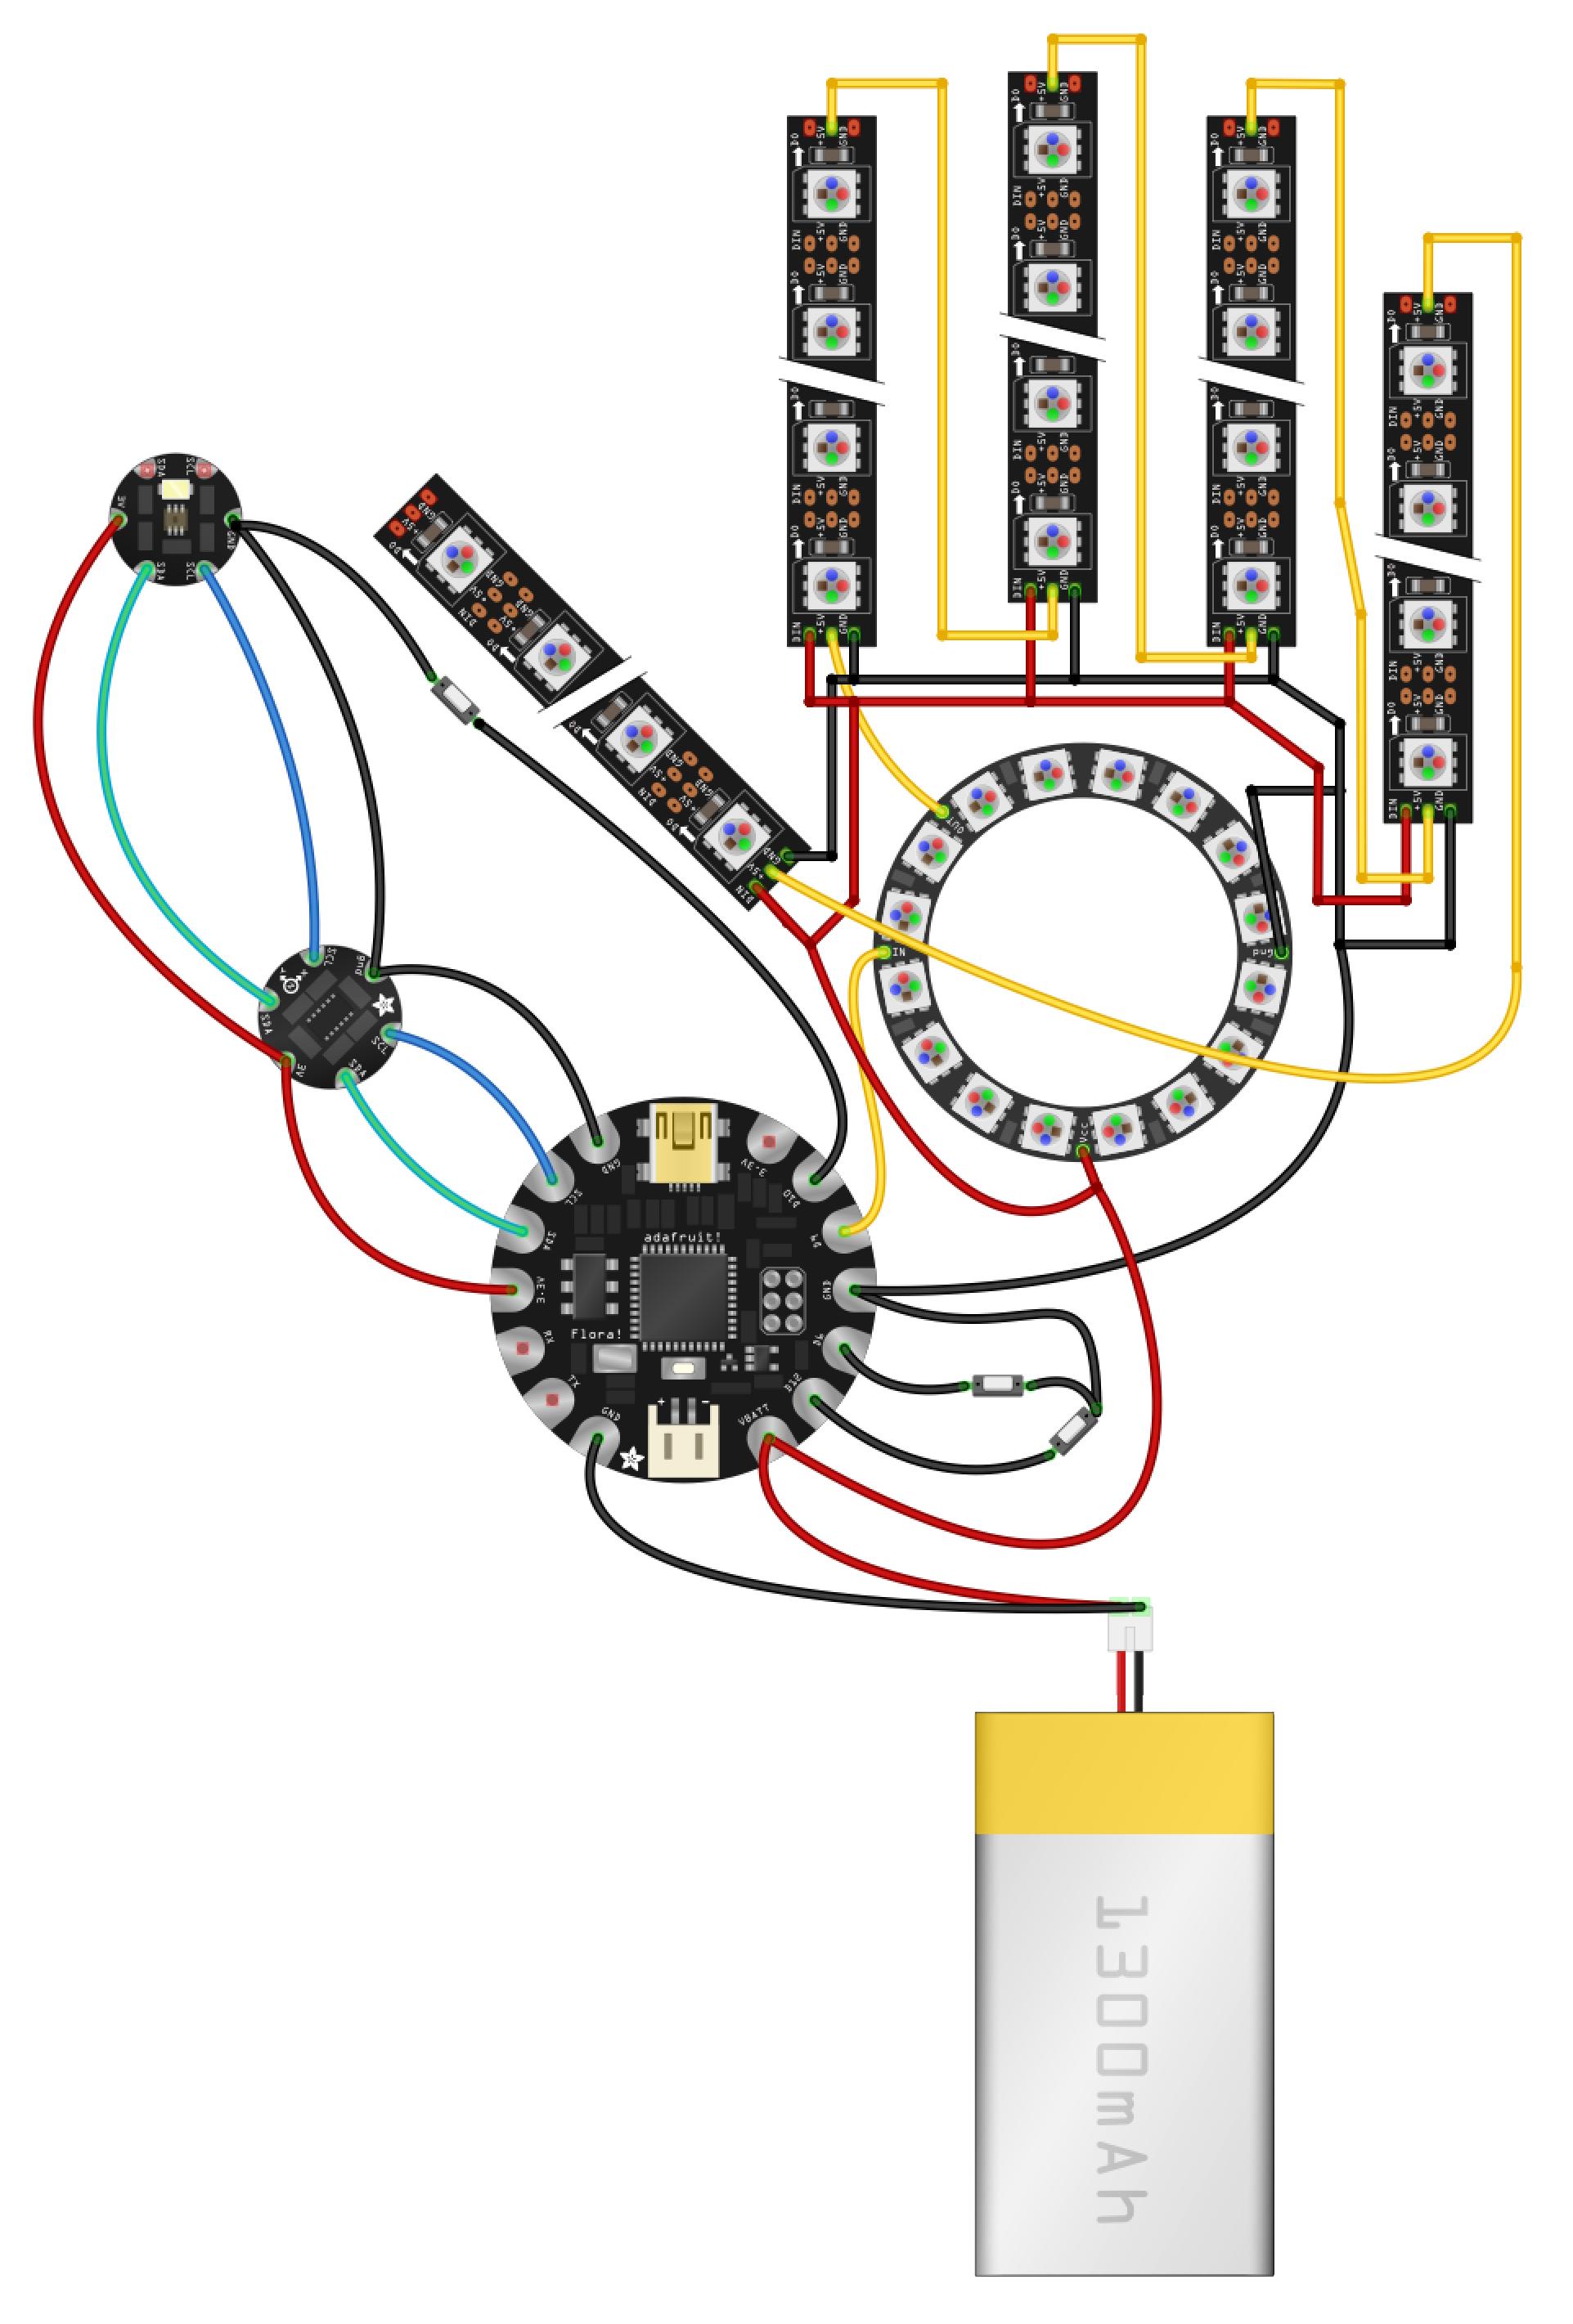 light_chameleon_glove_schematic.png